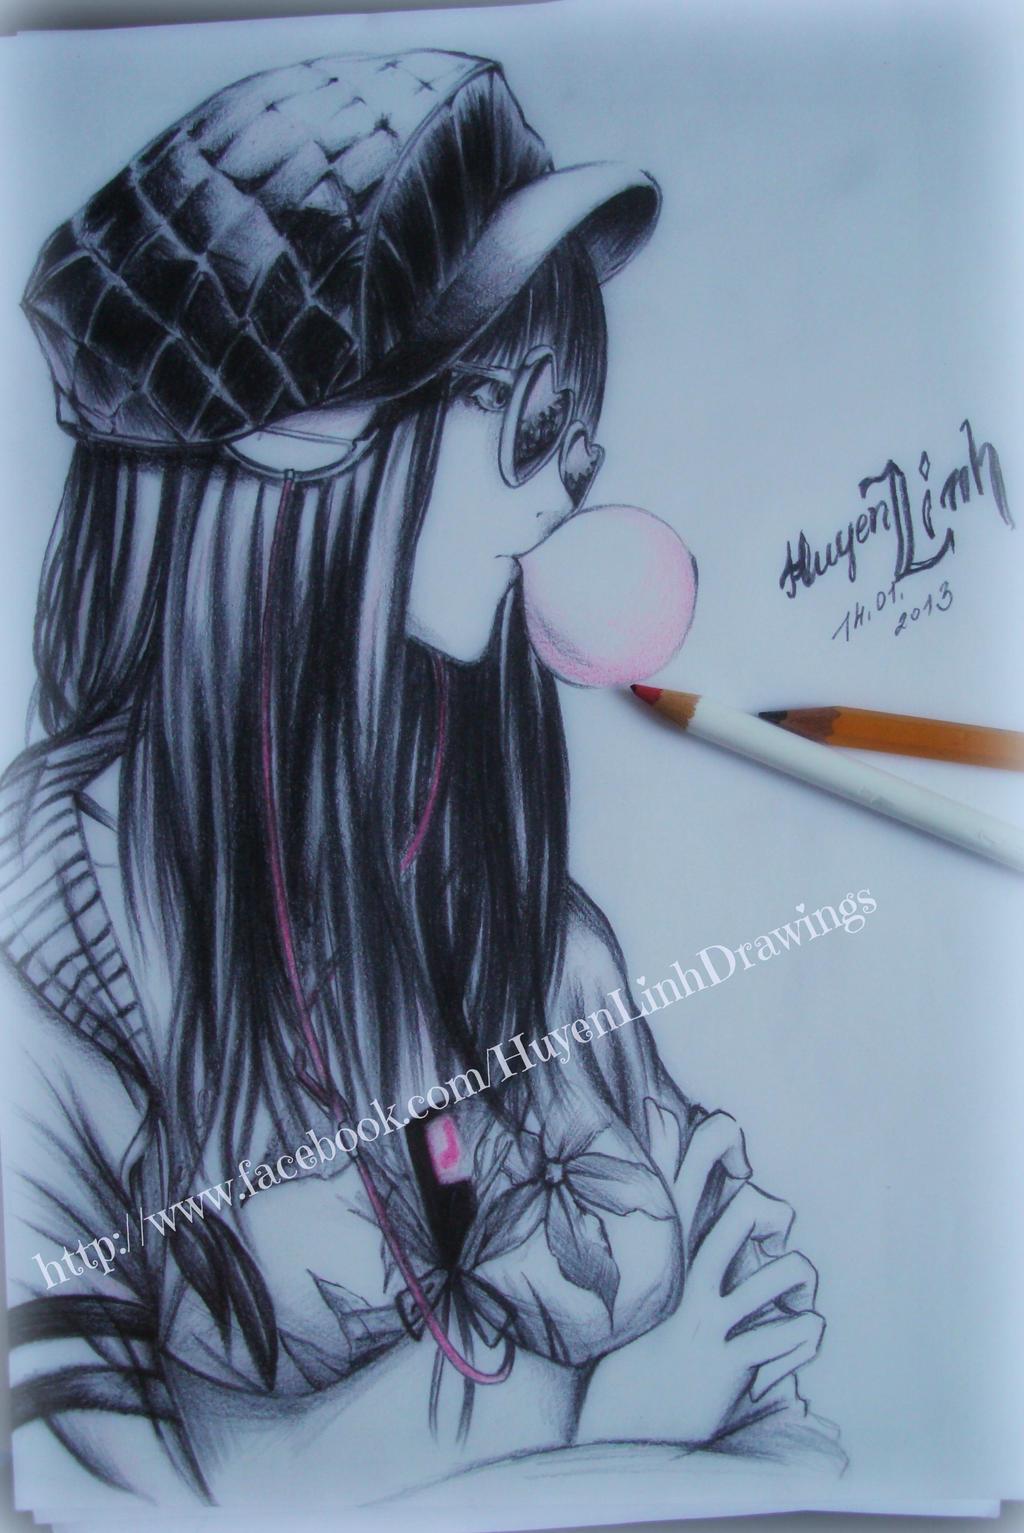 Drawing of Sawasawa by Huyen-Linh